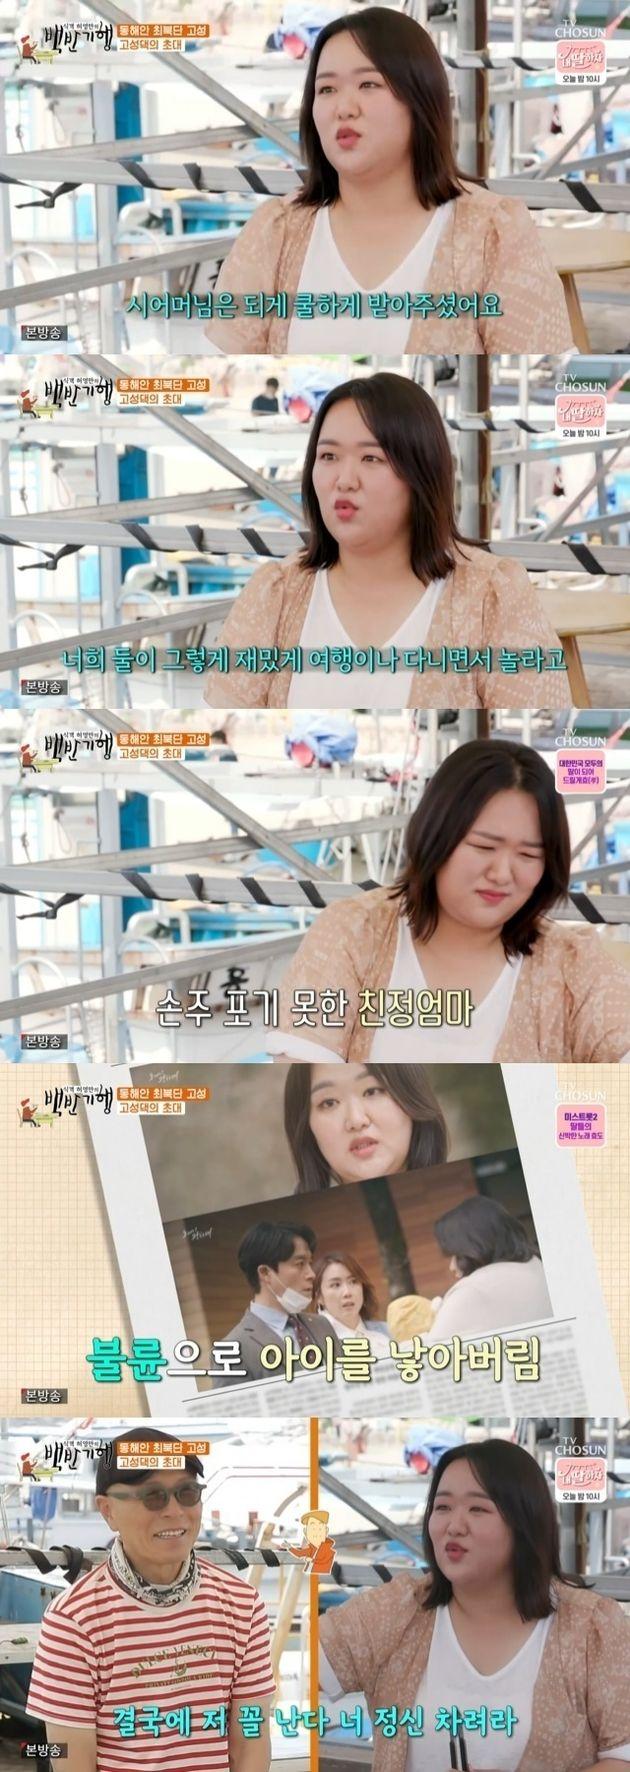 TV Chosun's foodie Heo Young-man